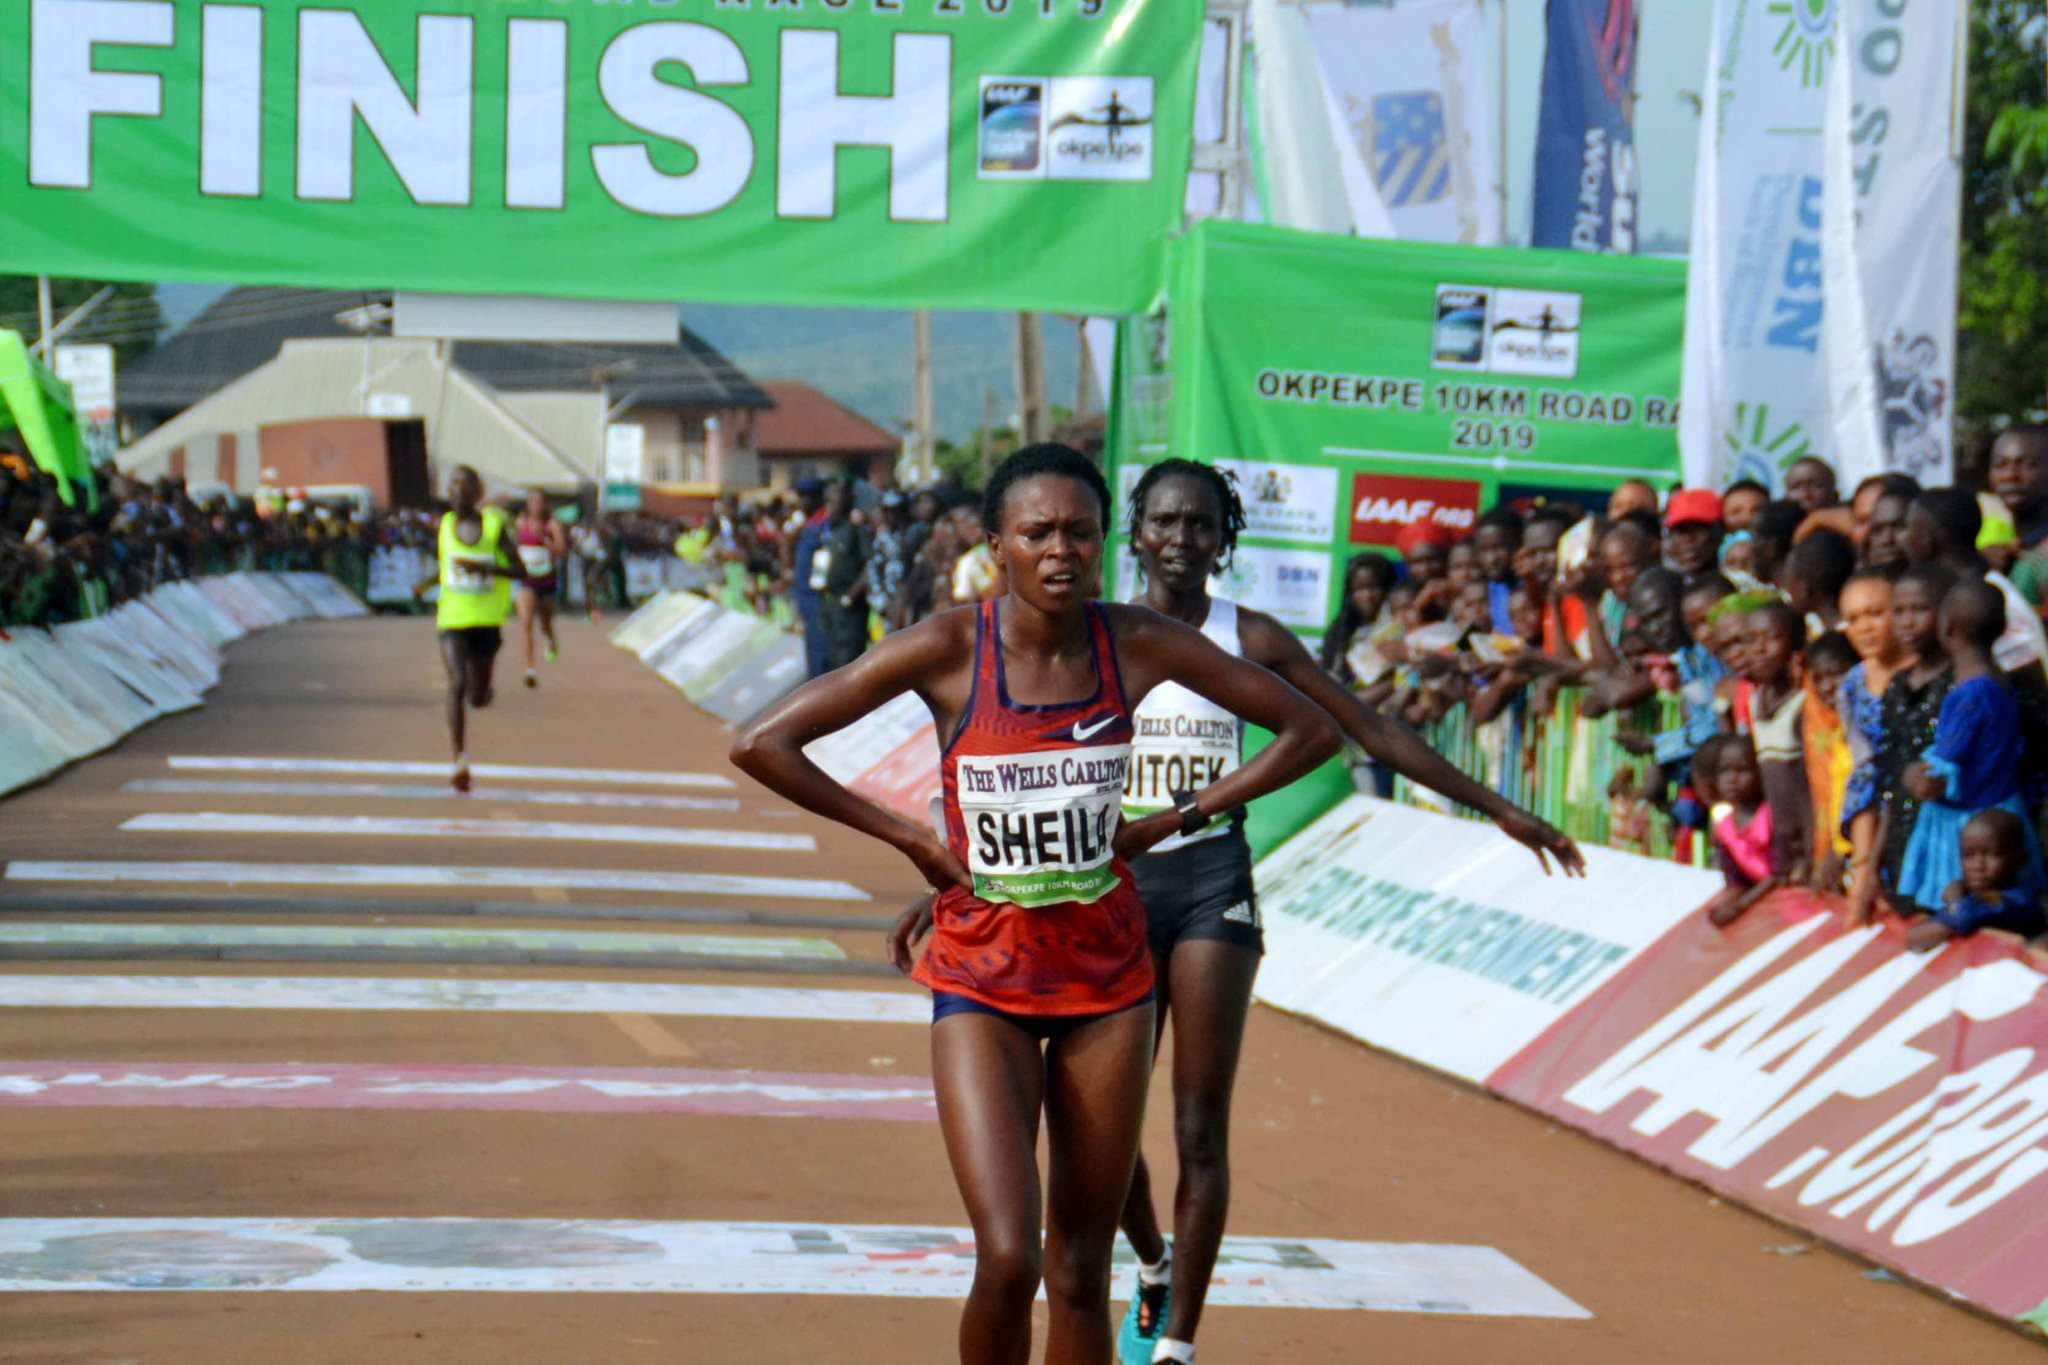 IAAF World Champs 2019: Okpekpe 10km Winner Chelangat Tops Kenya's Women's 5,000m List